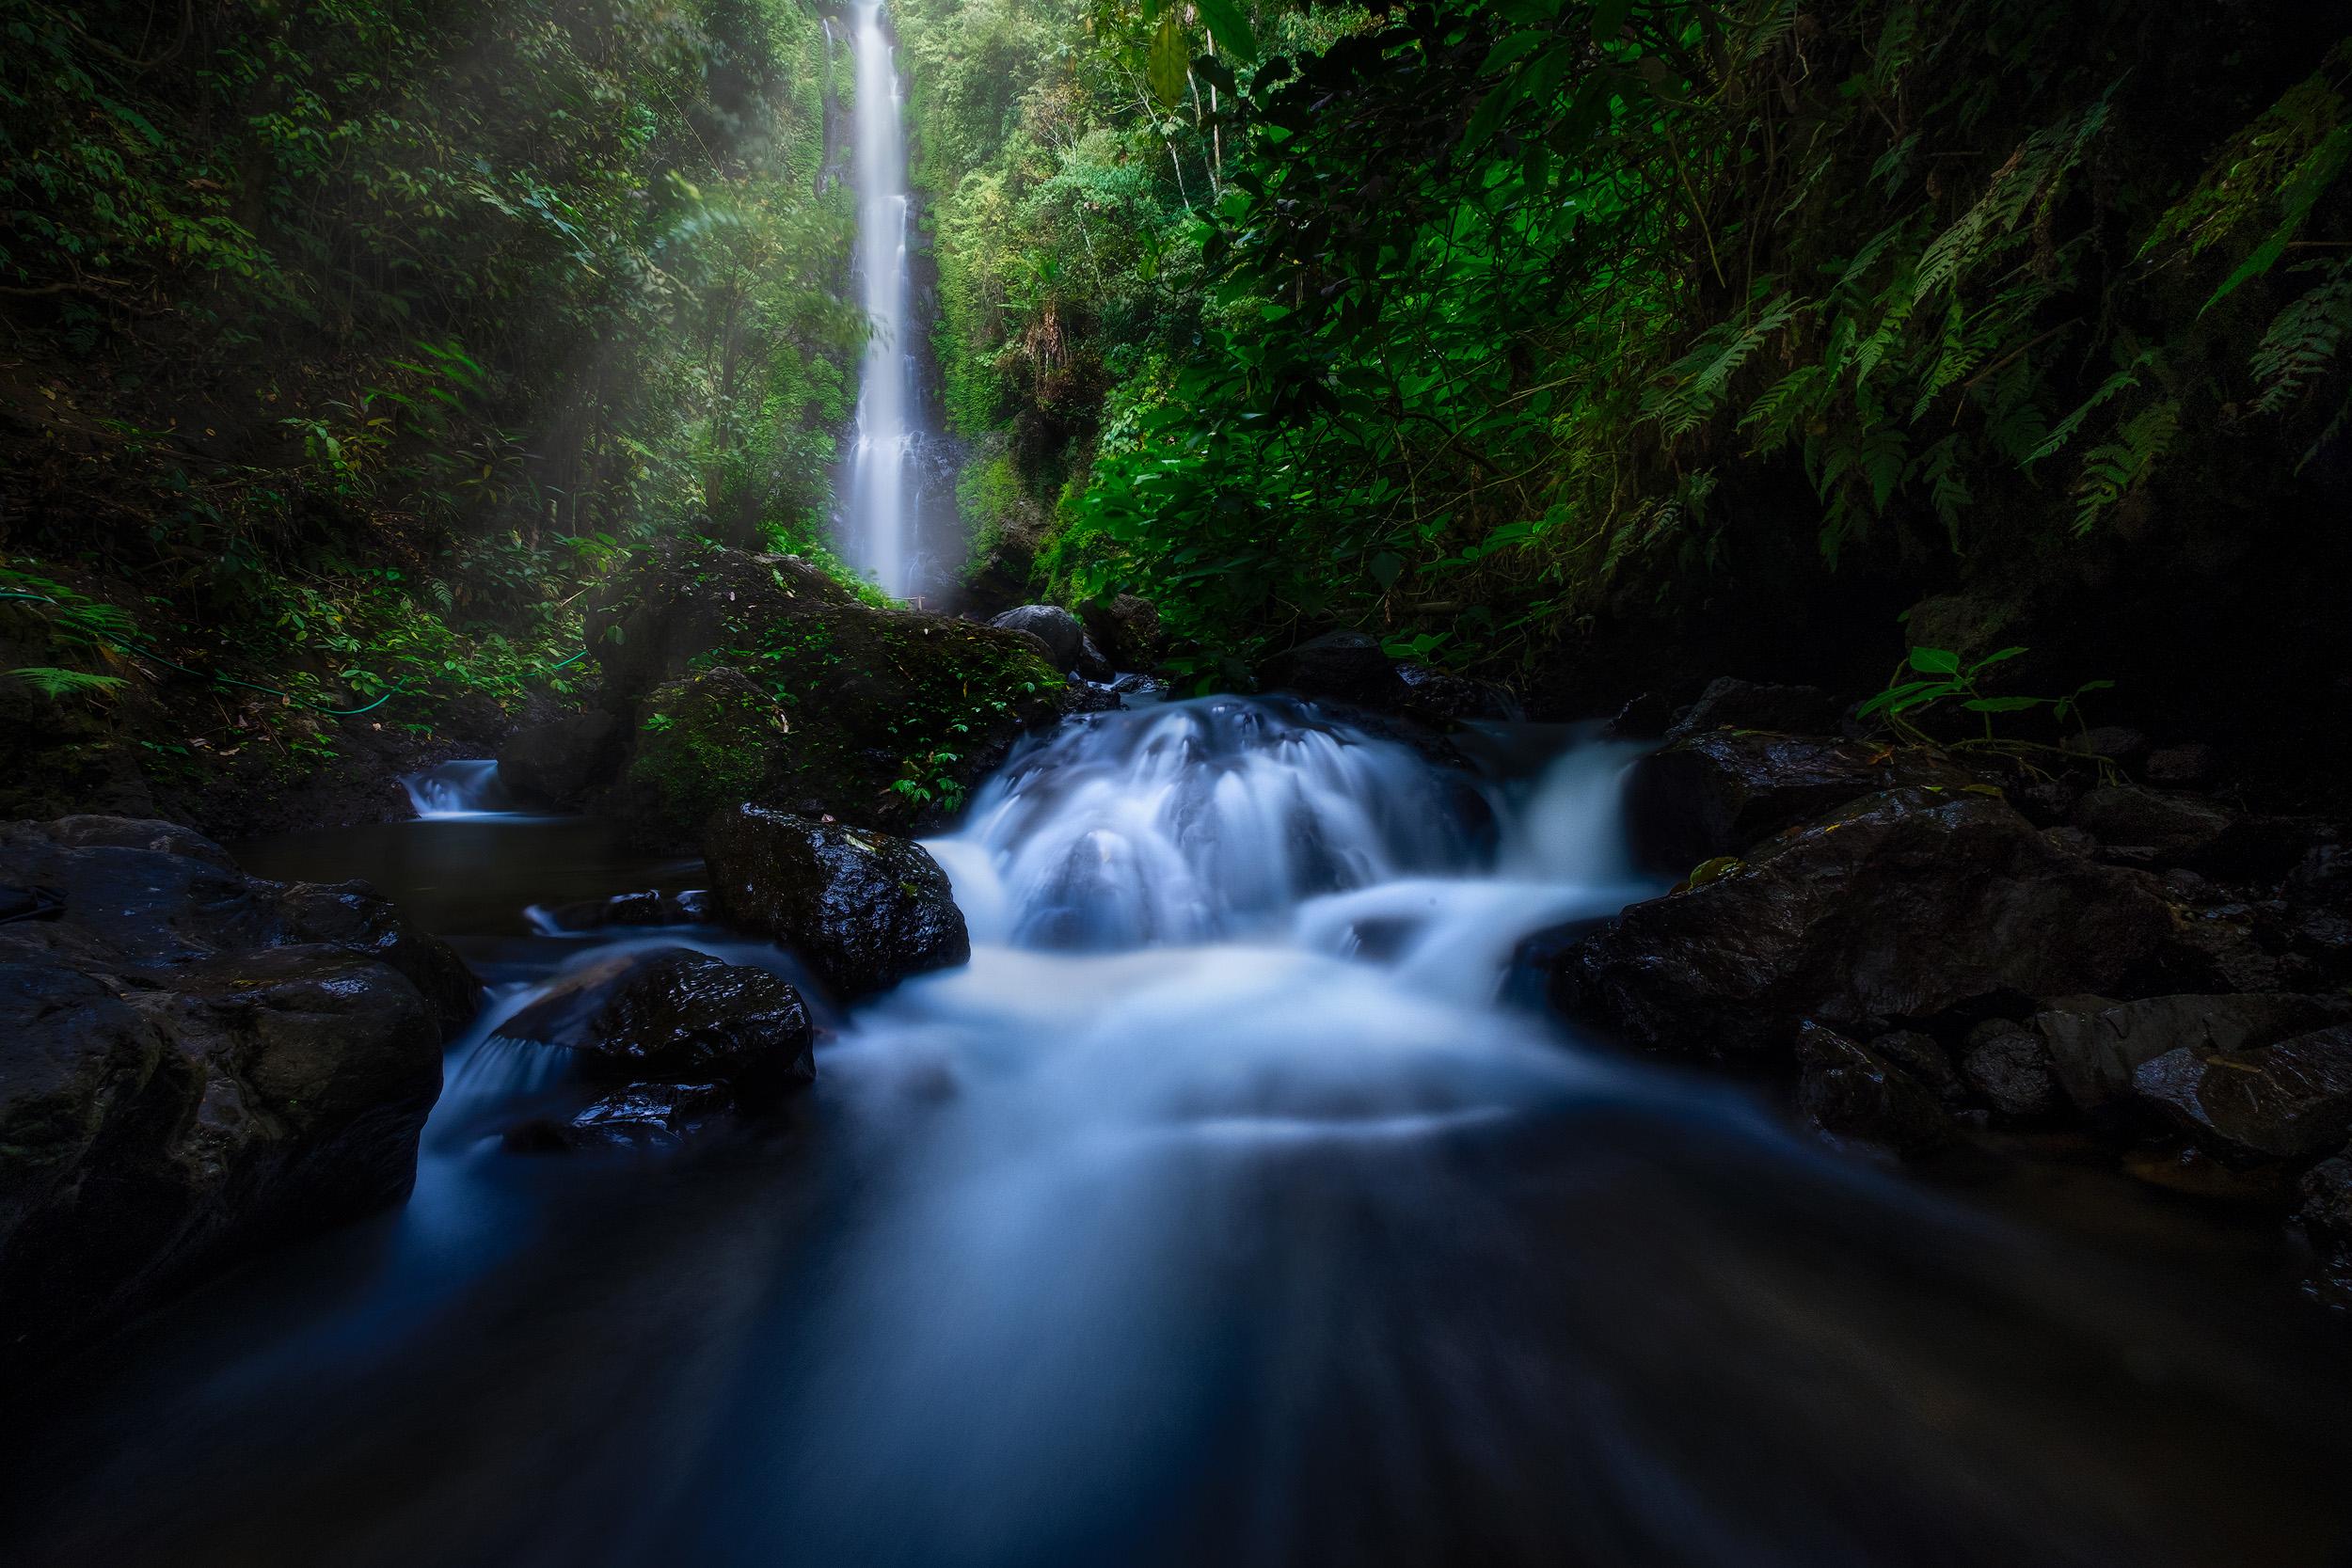 Munduk Waterfall   Laangan waterfalls in the Munduk hills of central Bali, Indonesia